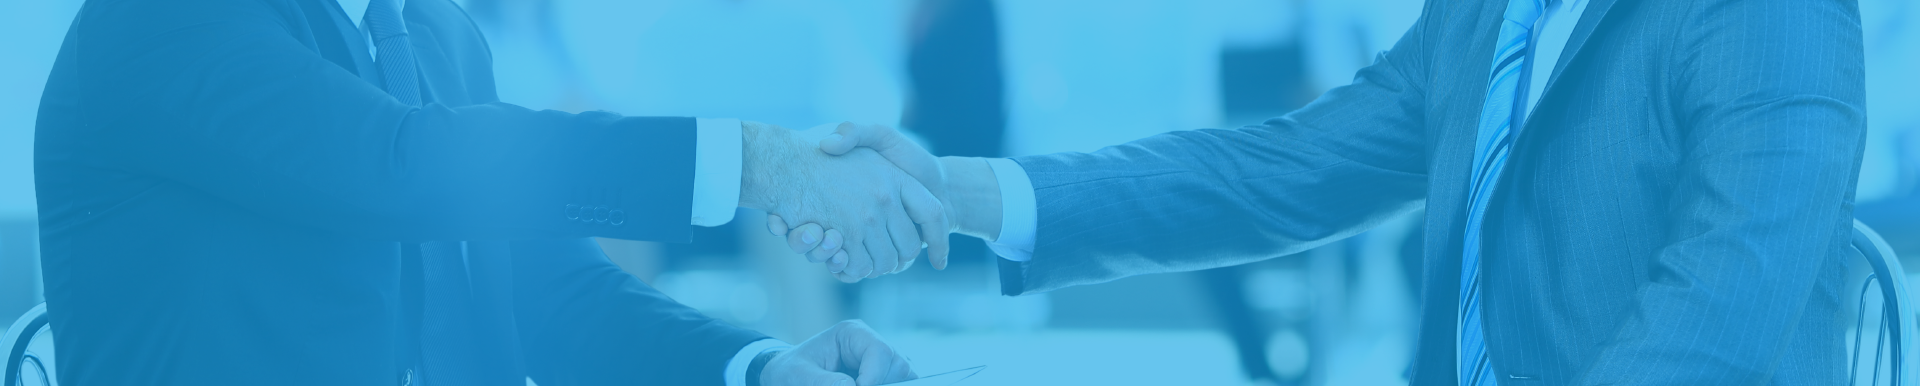 paginatitels – werkgevers deal